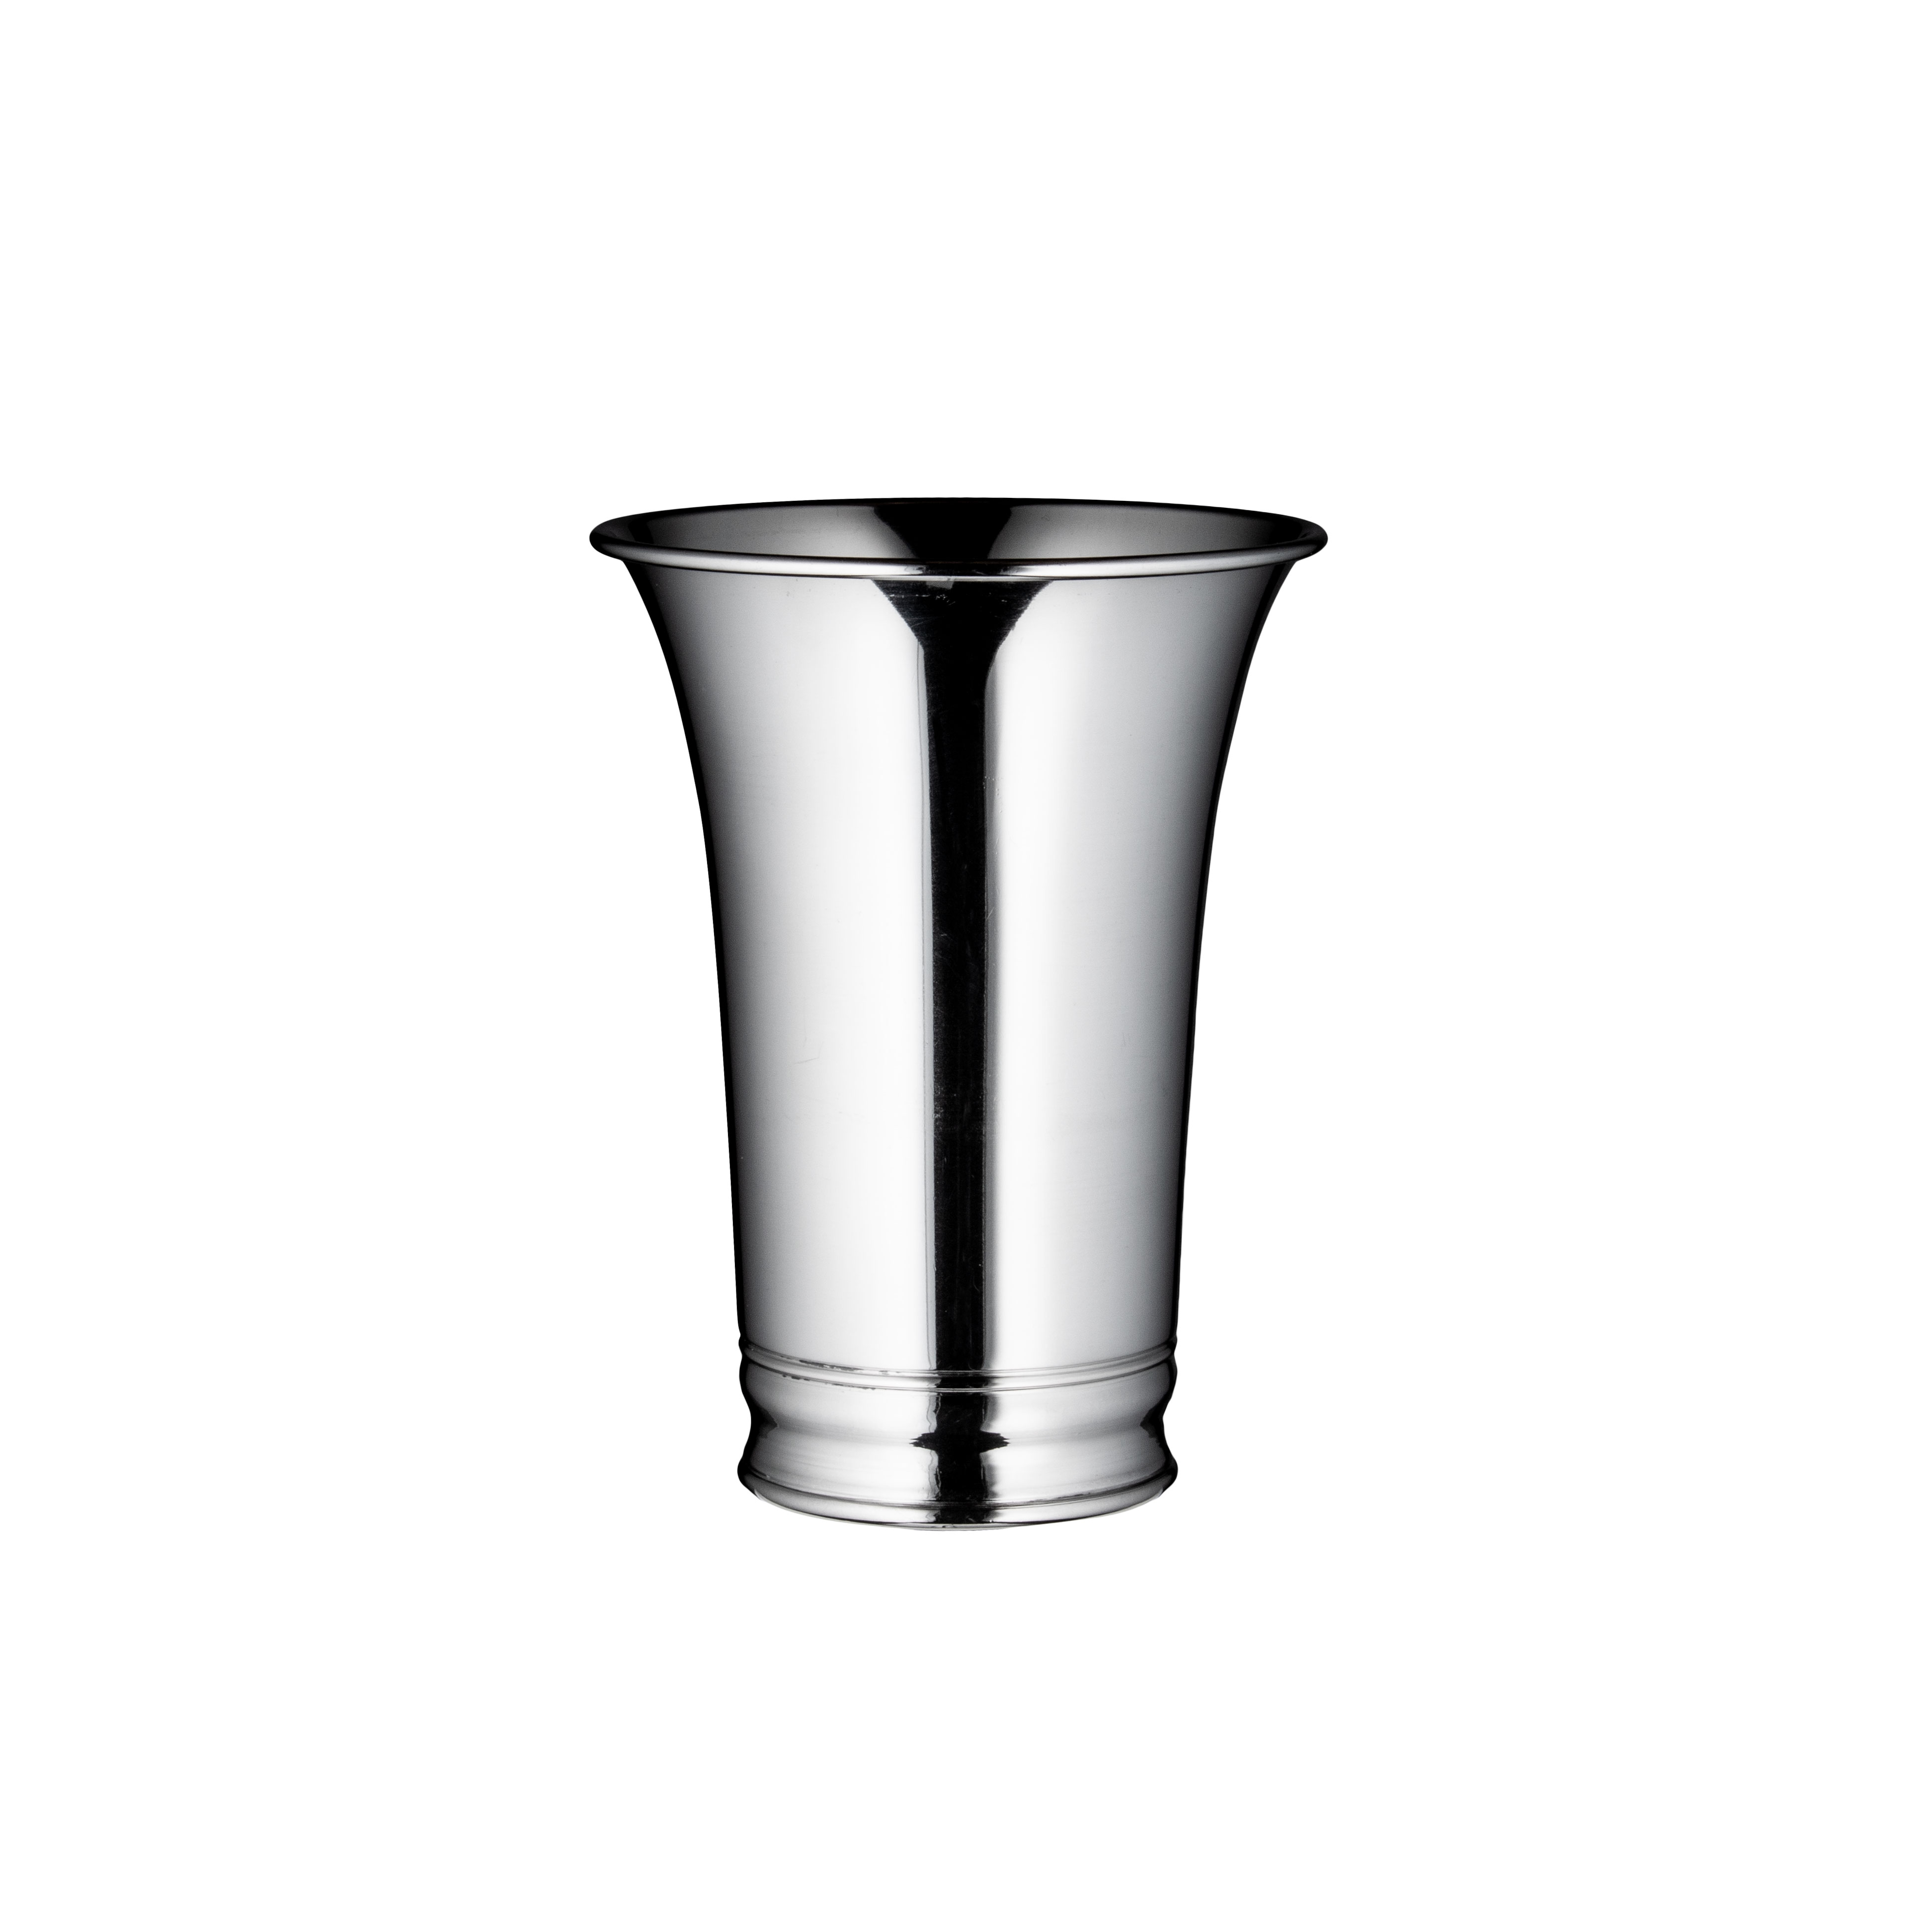 David Andersen vase / pokal